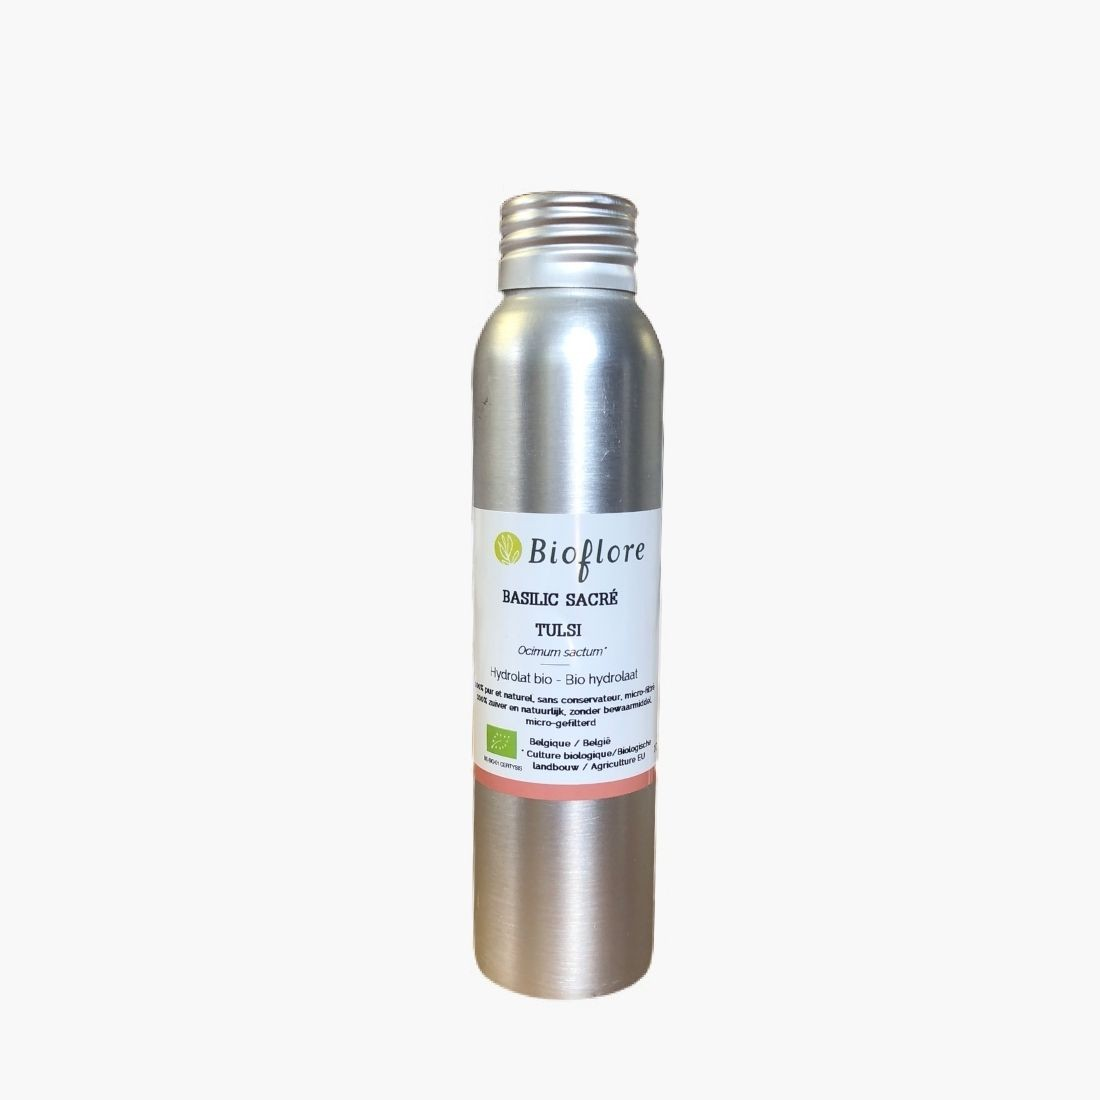 Hydrolat de Basilic Sacré BIO Bioflore